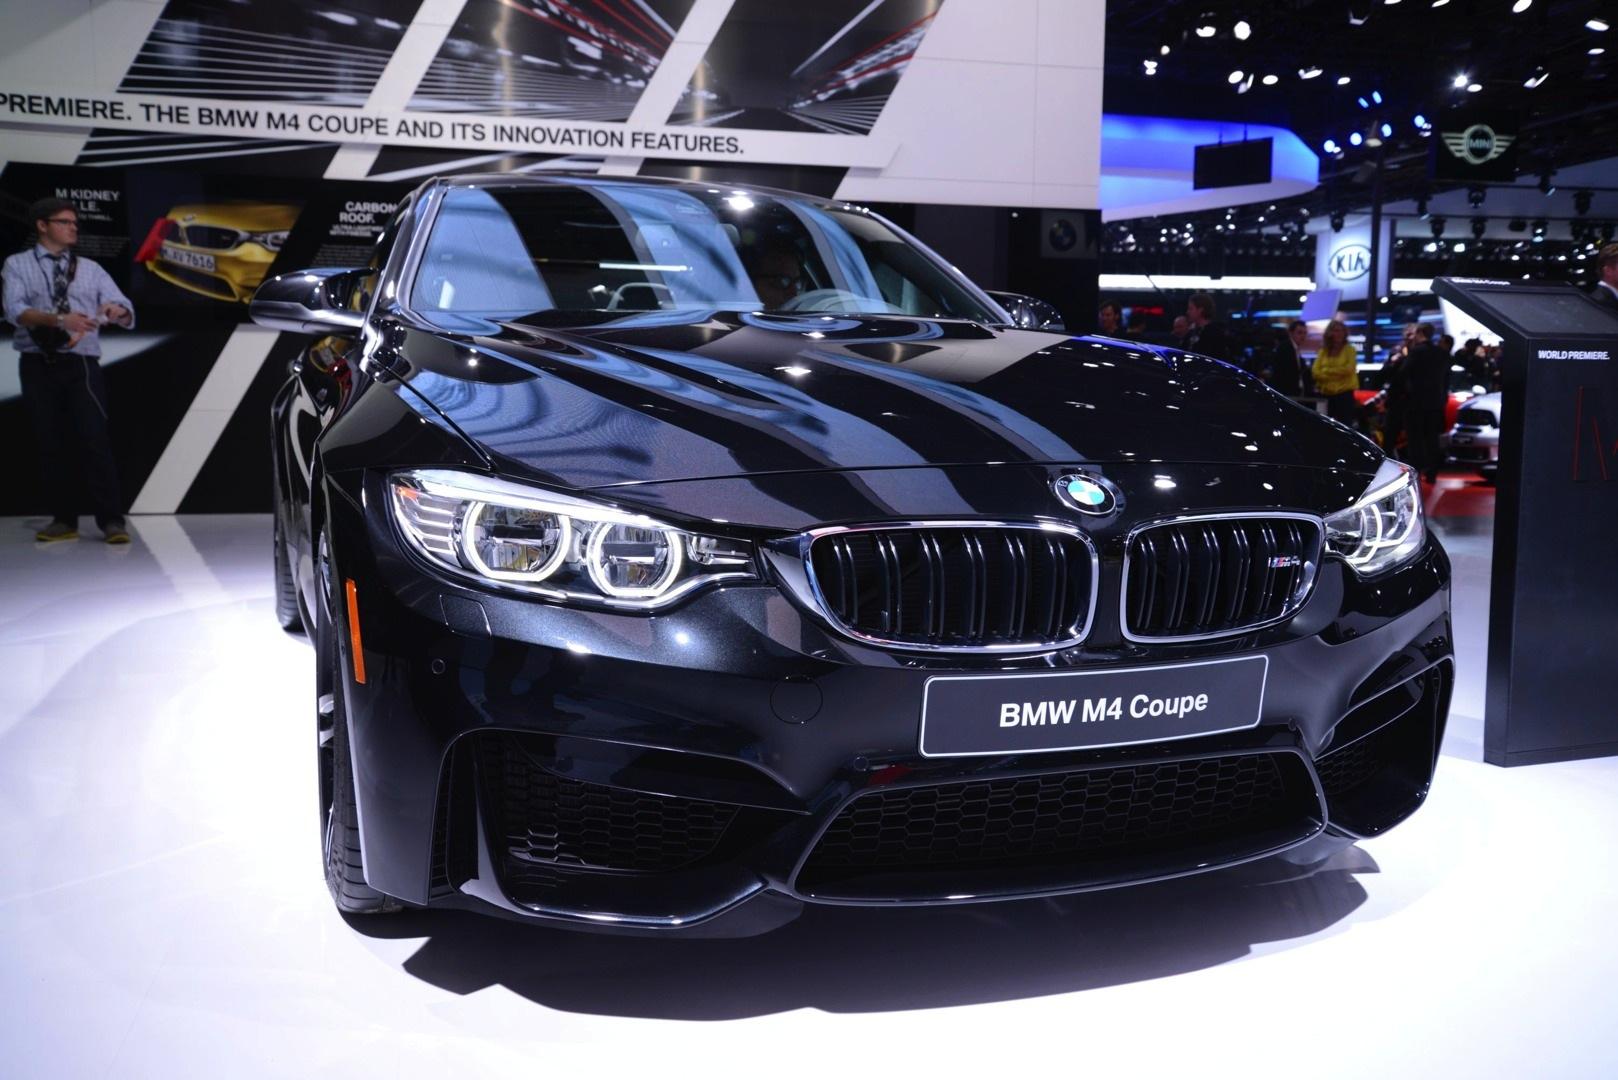 Bmw M4 Interior >> Sapphire Black BMW M4 Looks Brilliant at 2014 NAIAS [Live Photos] - autoevolution